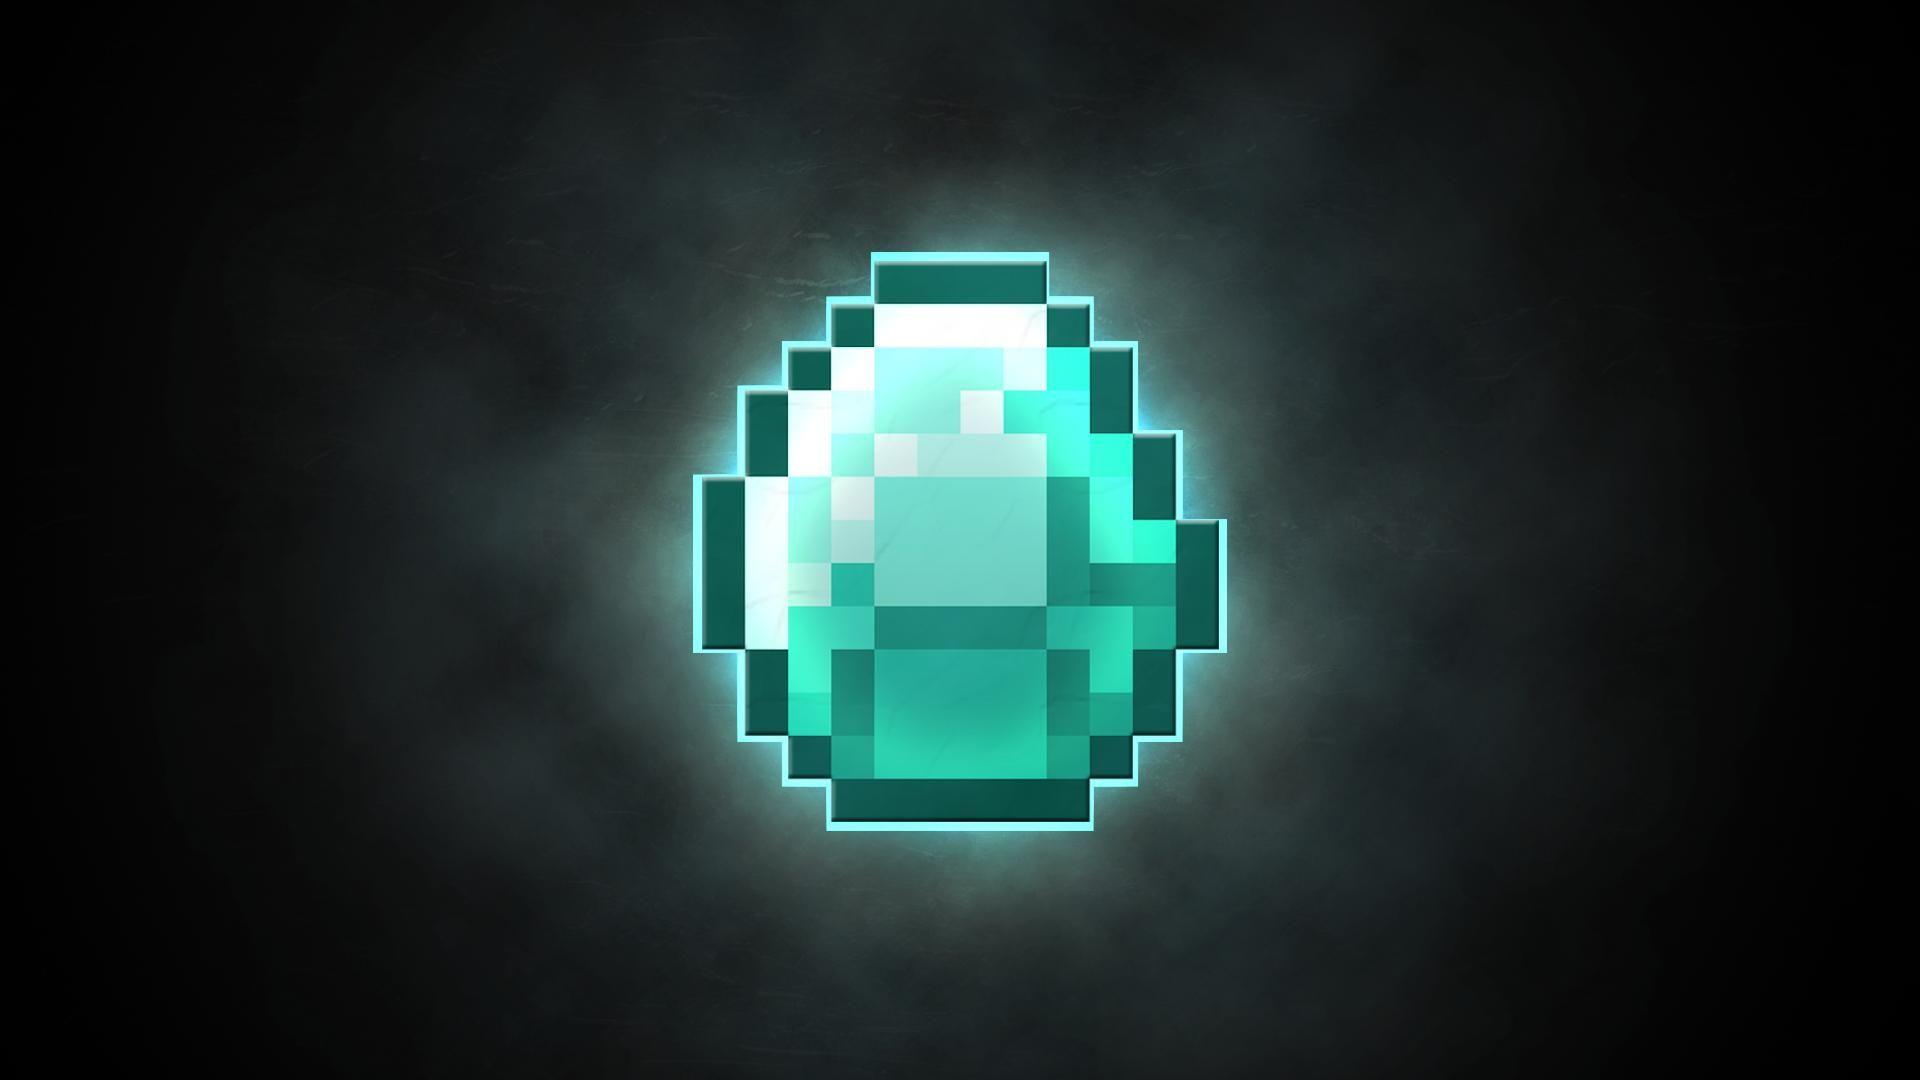 Minecraft Diamond Wallpaper 배경화면 손글씨 마인크래프트